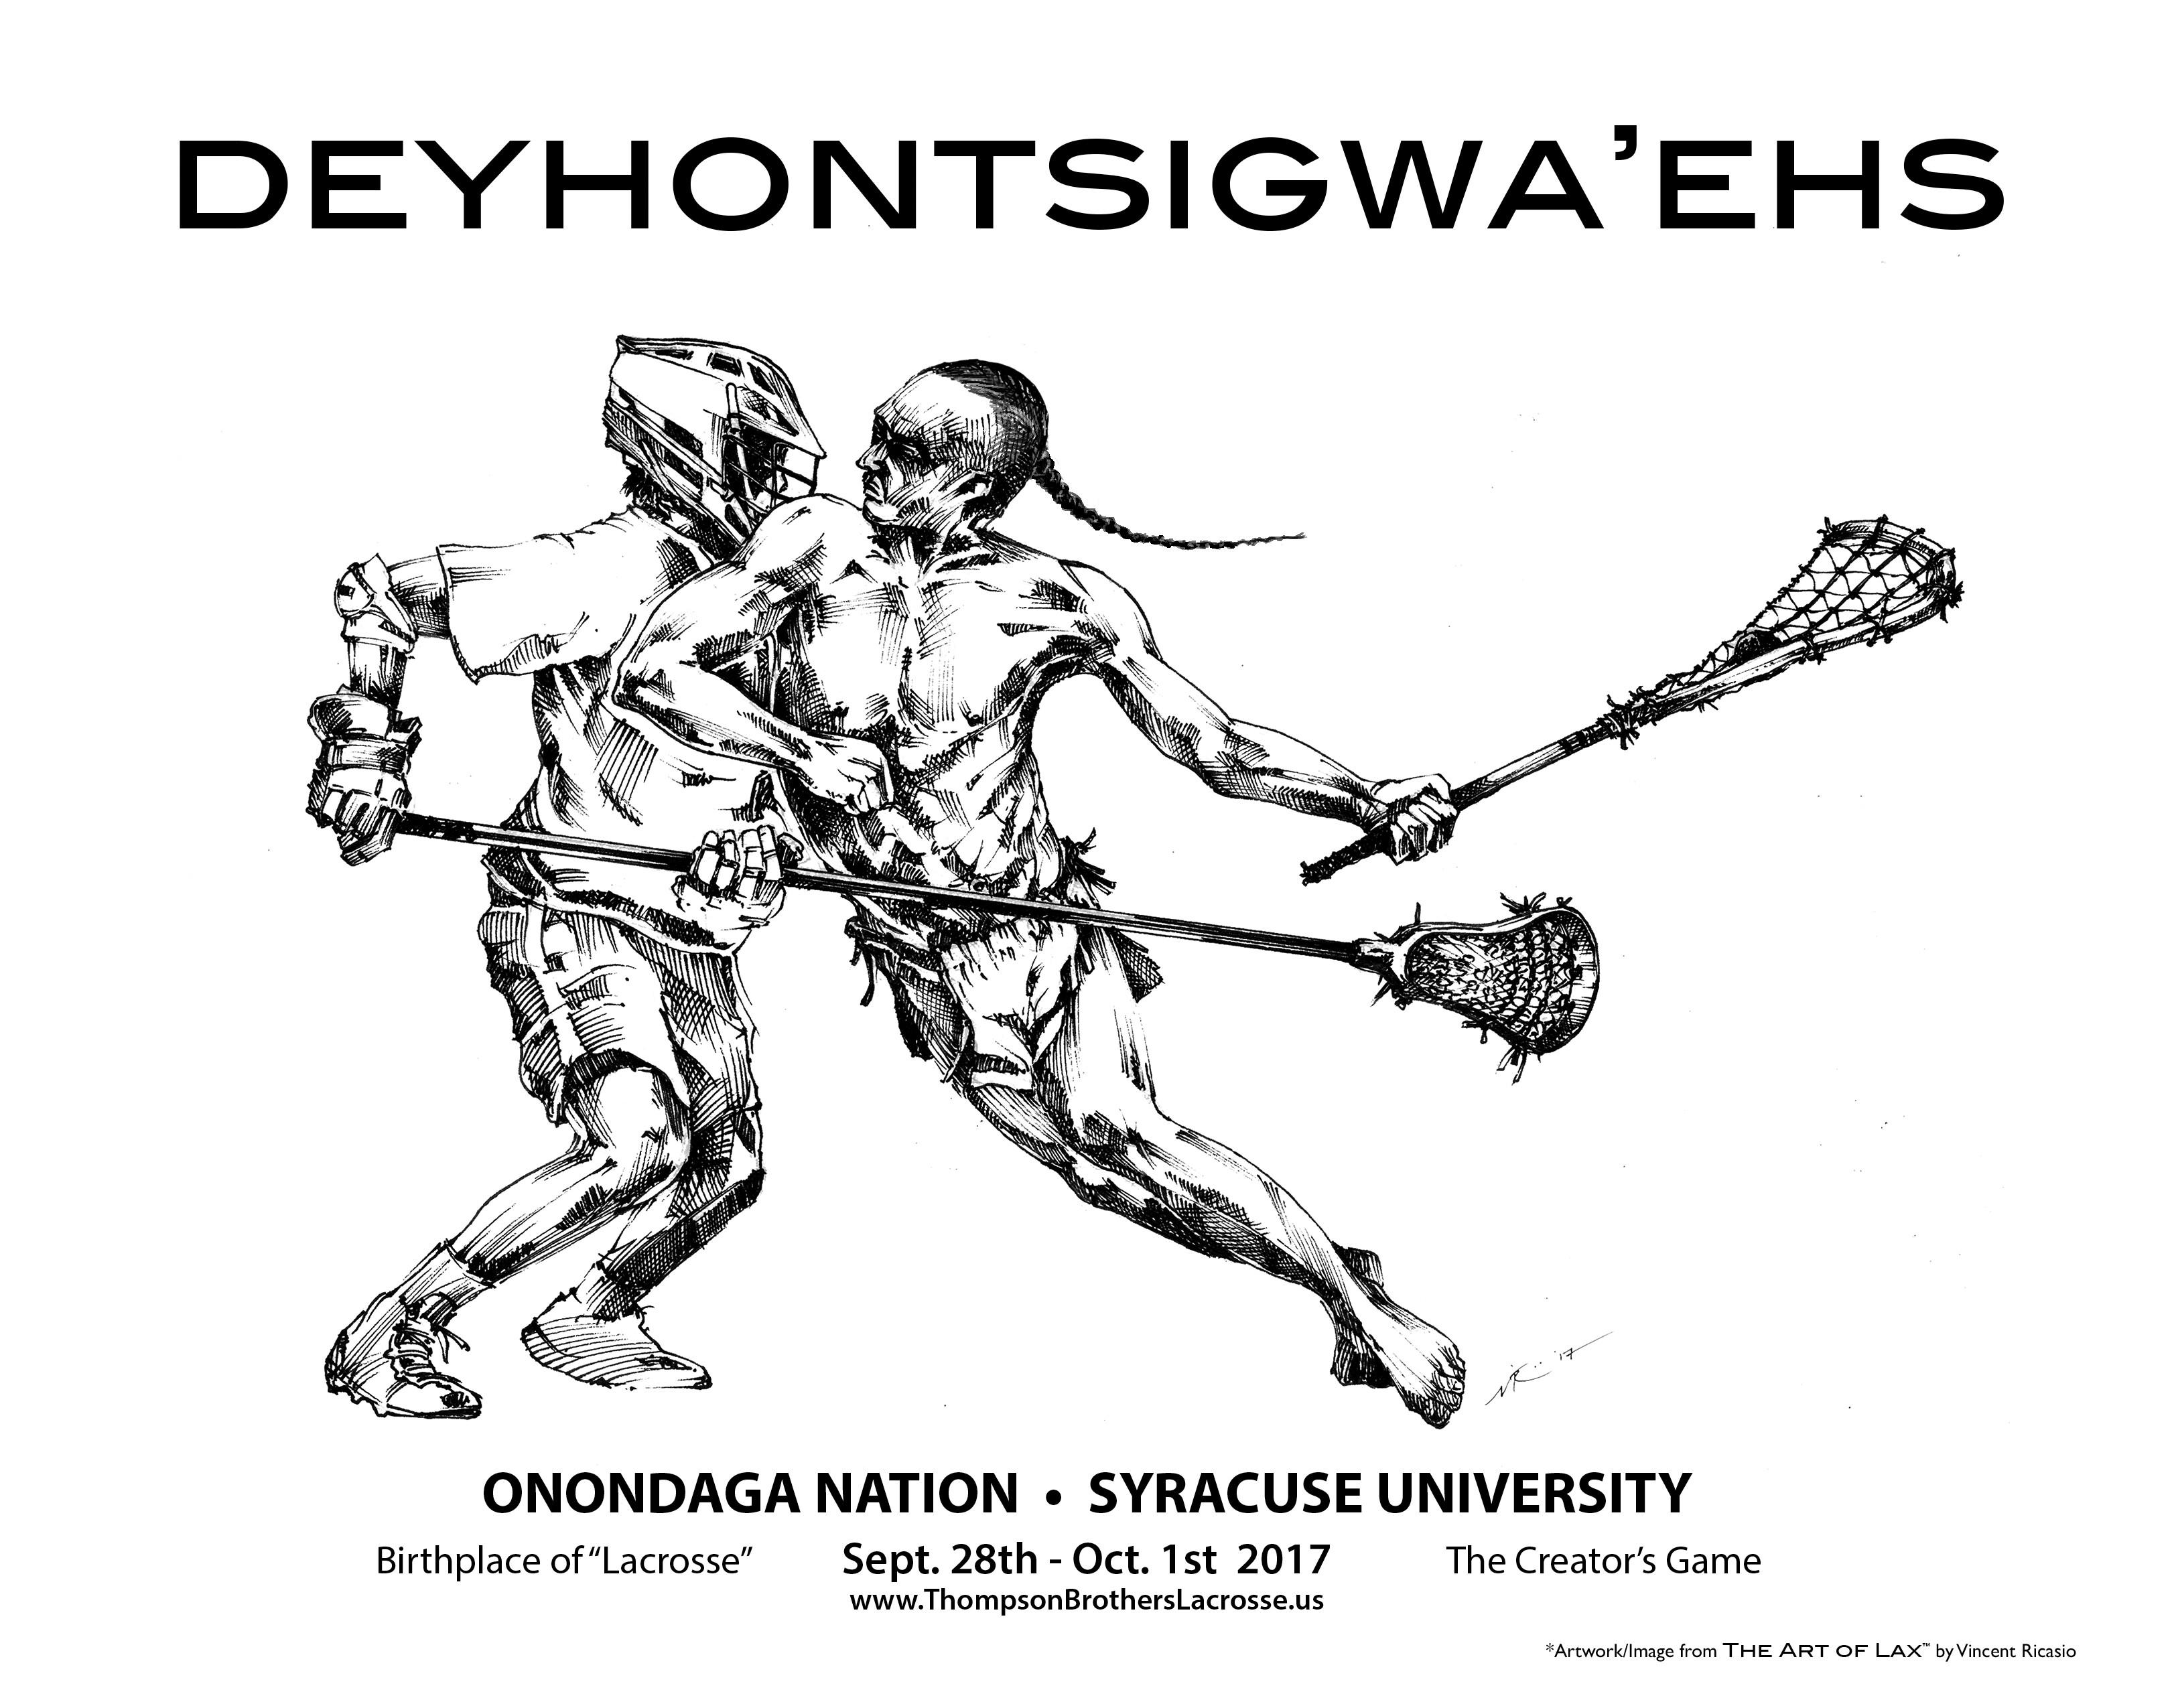 Deyhontsigwa'ehs-The Creator's Game Lacrosse.